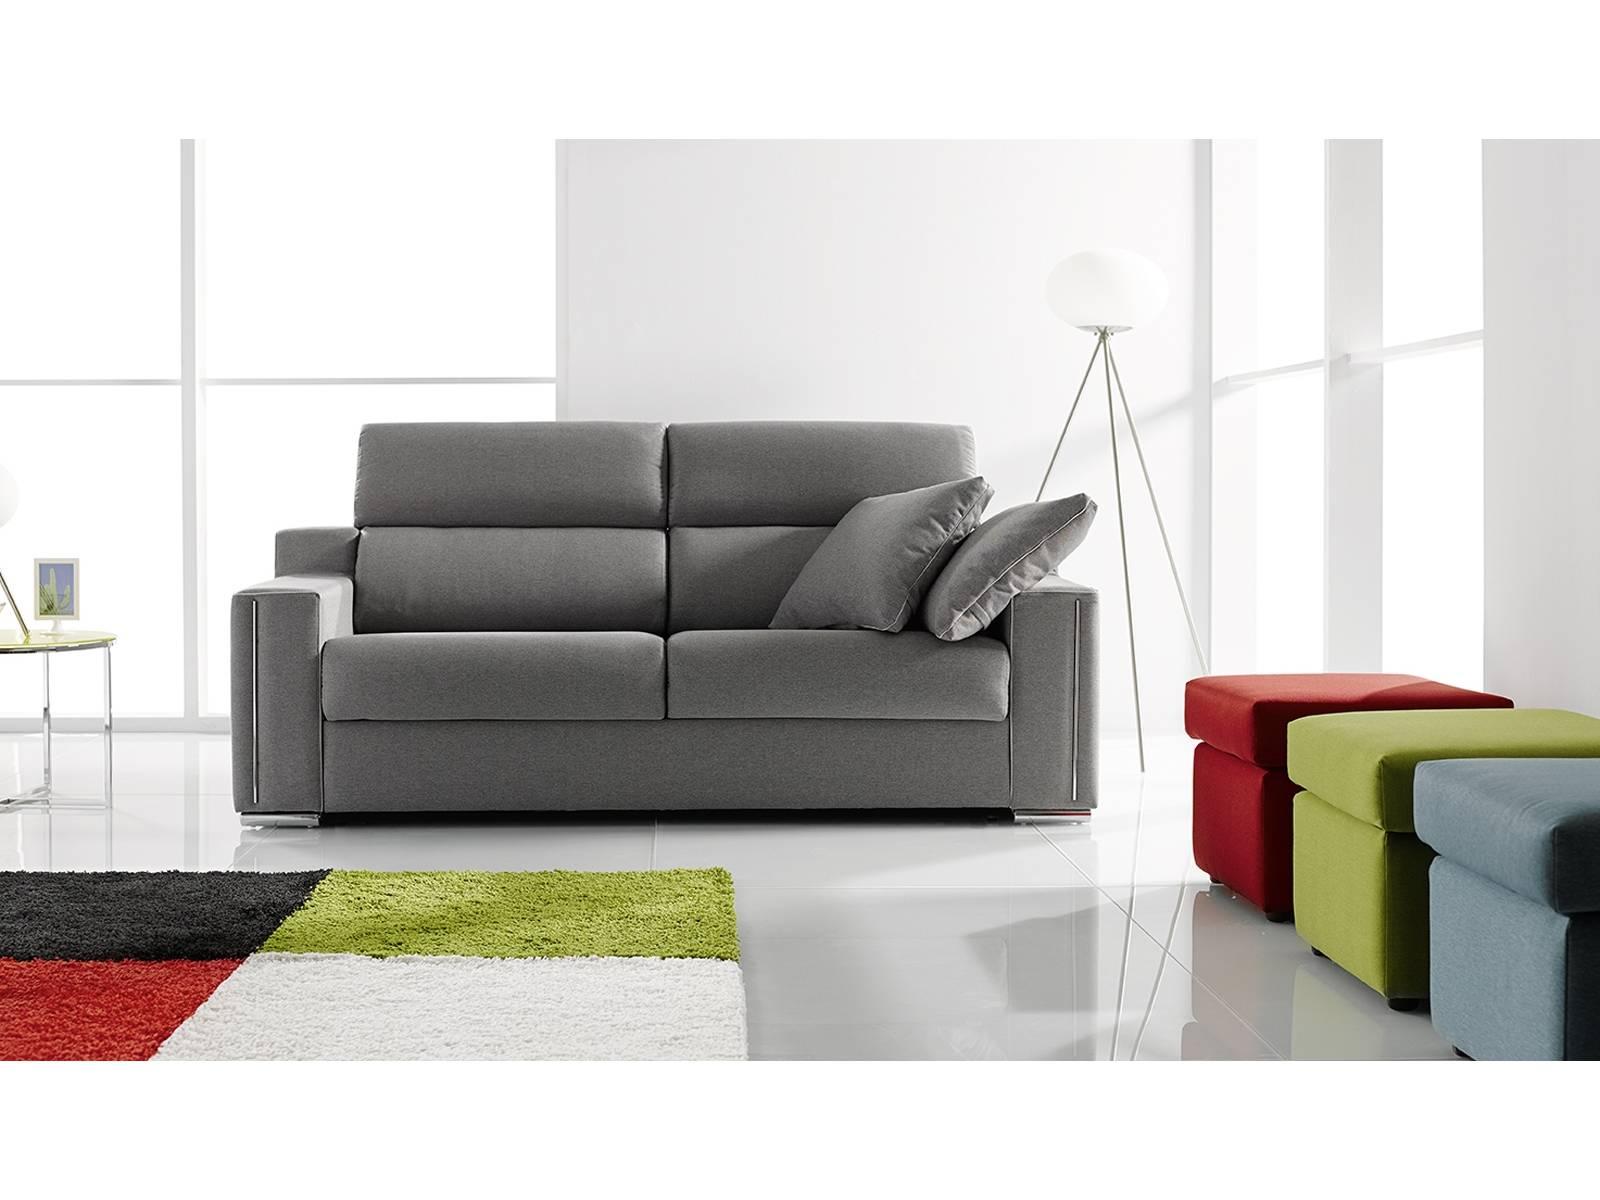 Sofa Cama Merkamueble Ffdn sofa Cama Merkamueble Sistema Italiano sofas Hqdirectory